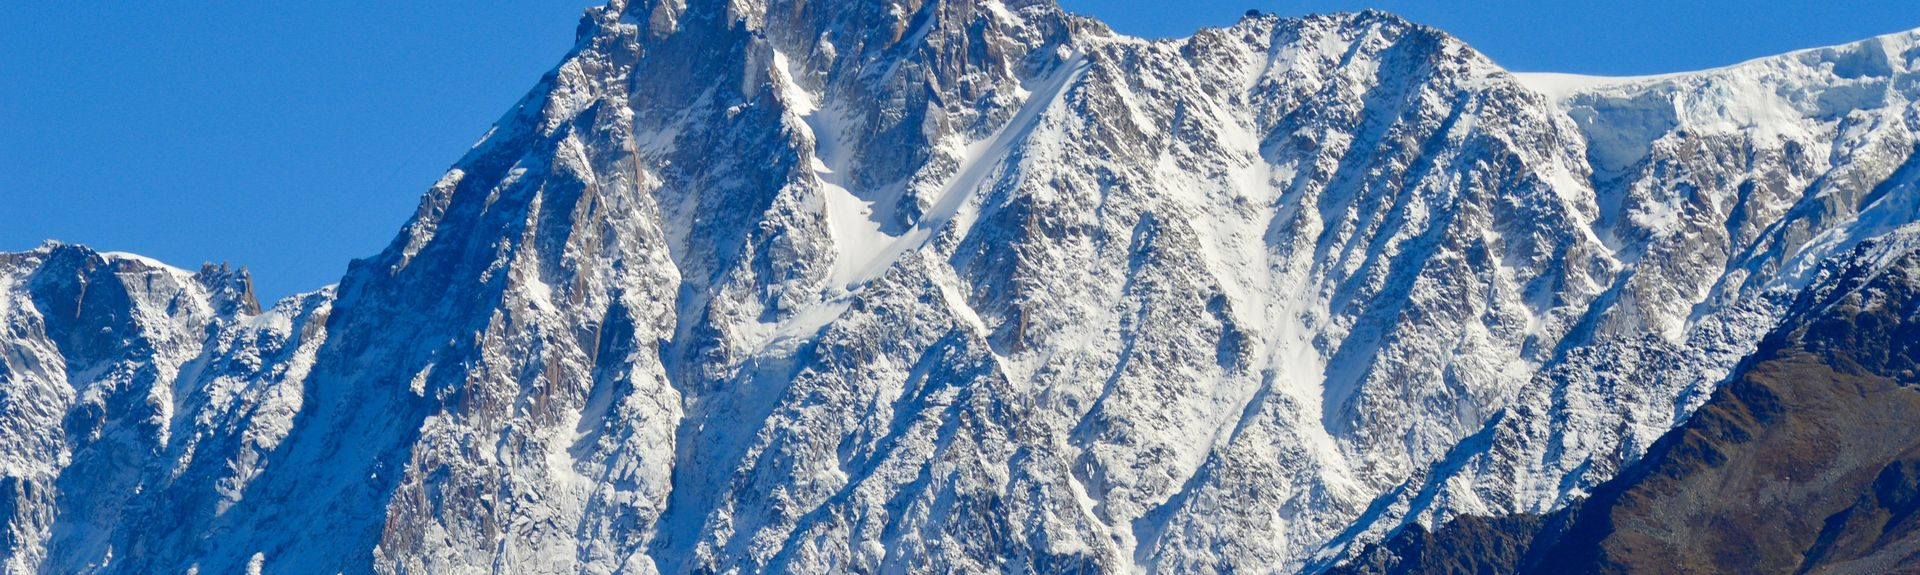 Chamonix - Planpraz-skilift, Chamonix-Mont-Blanc, Haute-Savoie (departement), Frankrijk